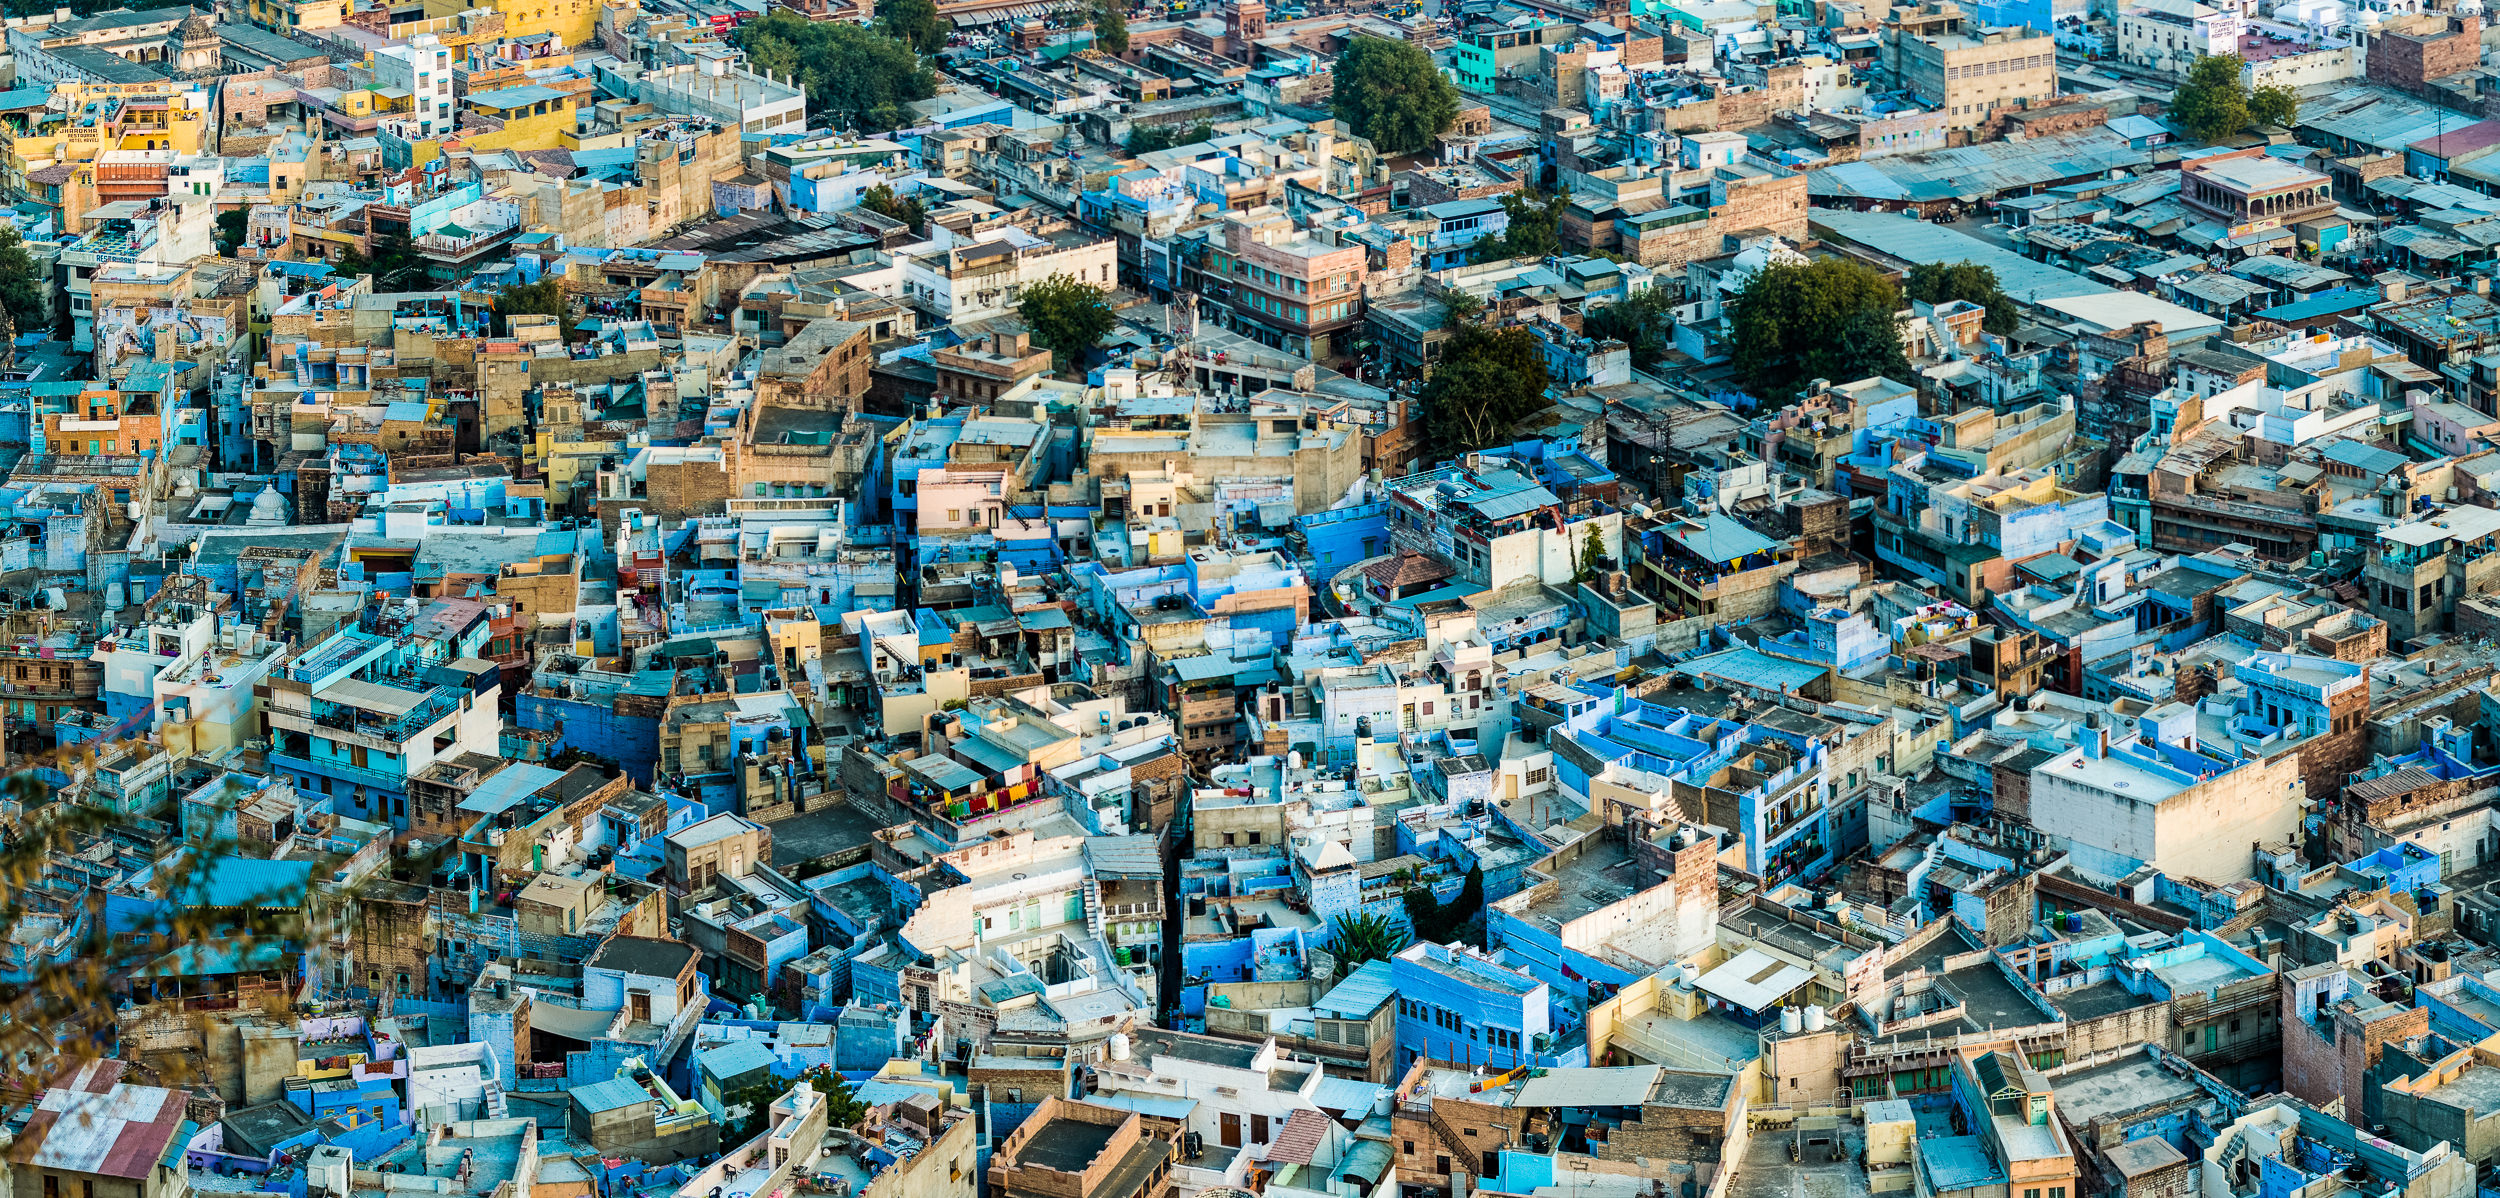 [2015 01 23] India 2015 Jodhpur (NIKON D800) 1734.jpg